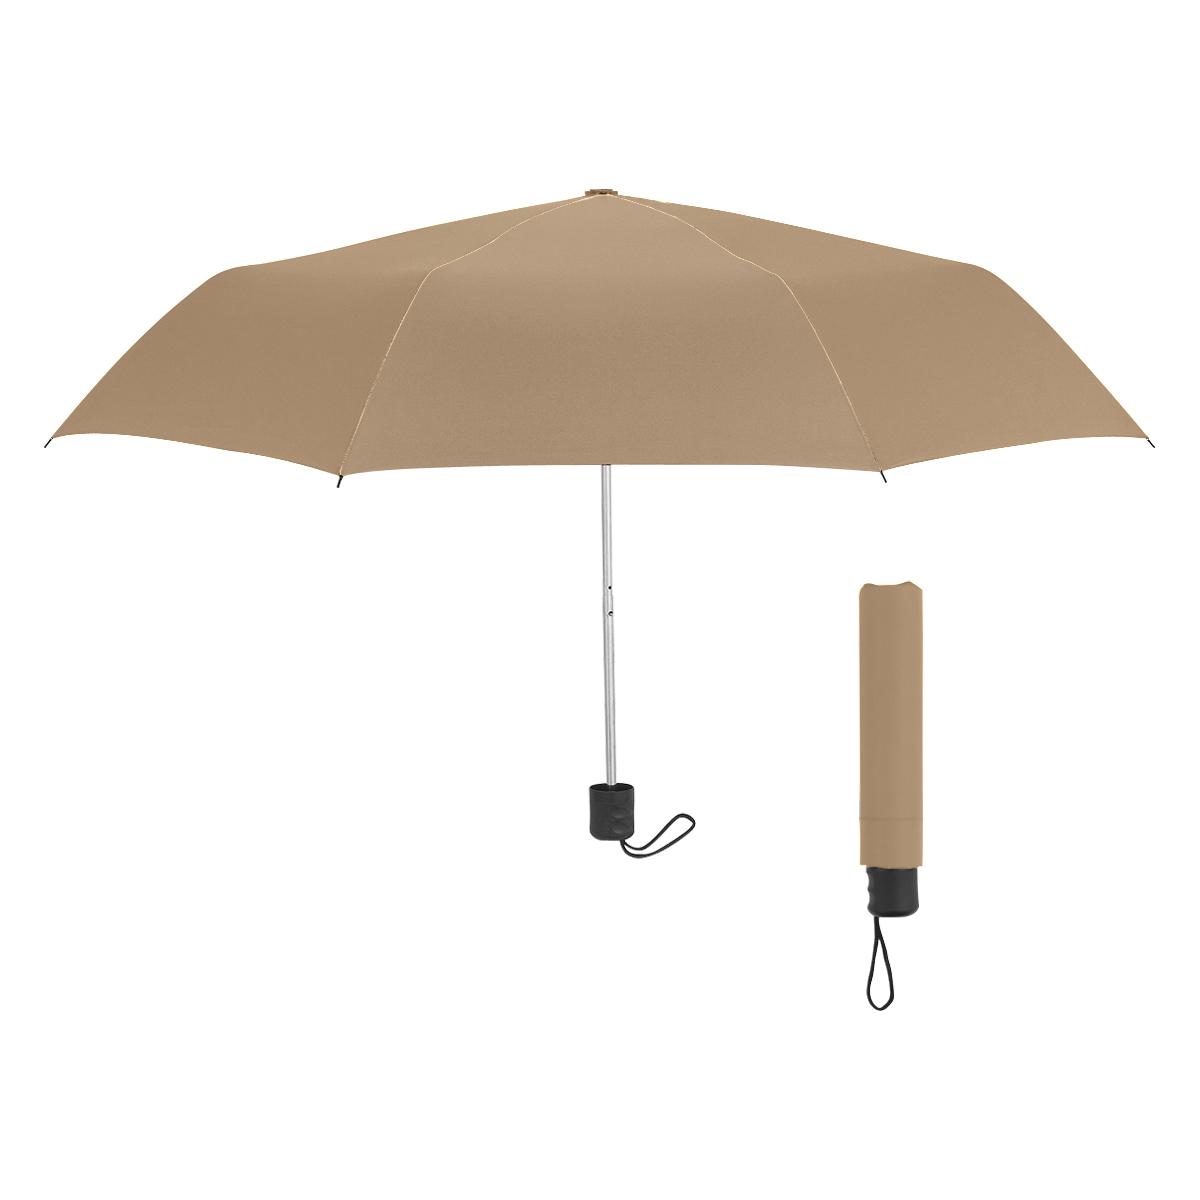 42 Inch Arc Budget Umbrella